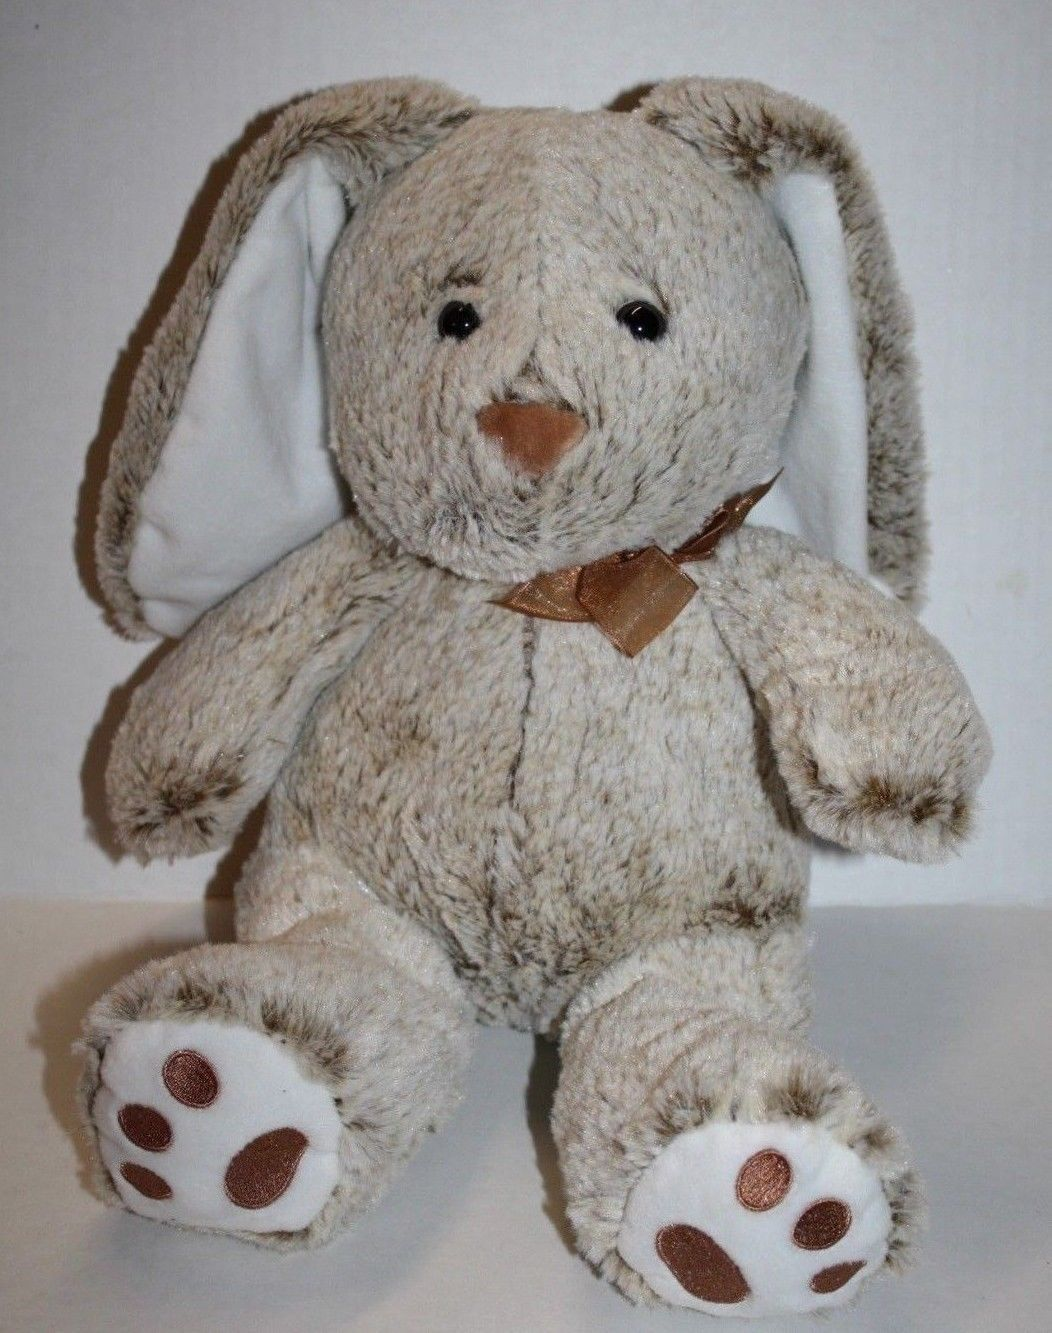 Blue Big Teddy Bear, Hugfun Easter Bunny Rabbit 13 Brown Plush And 50 Similar Items